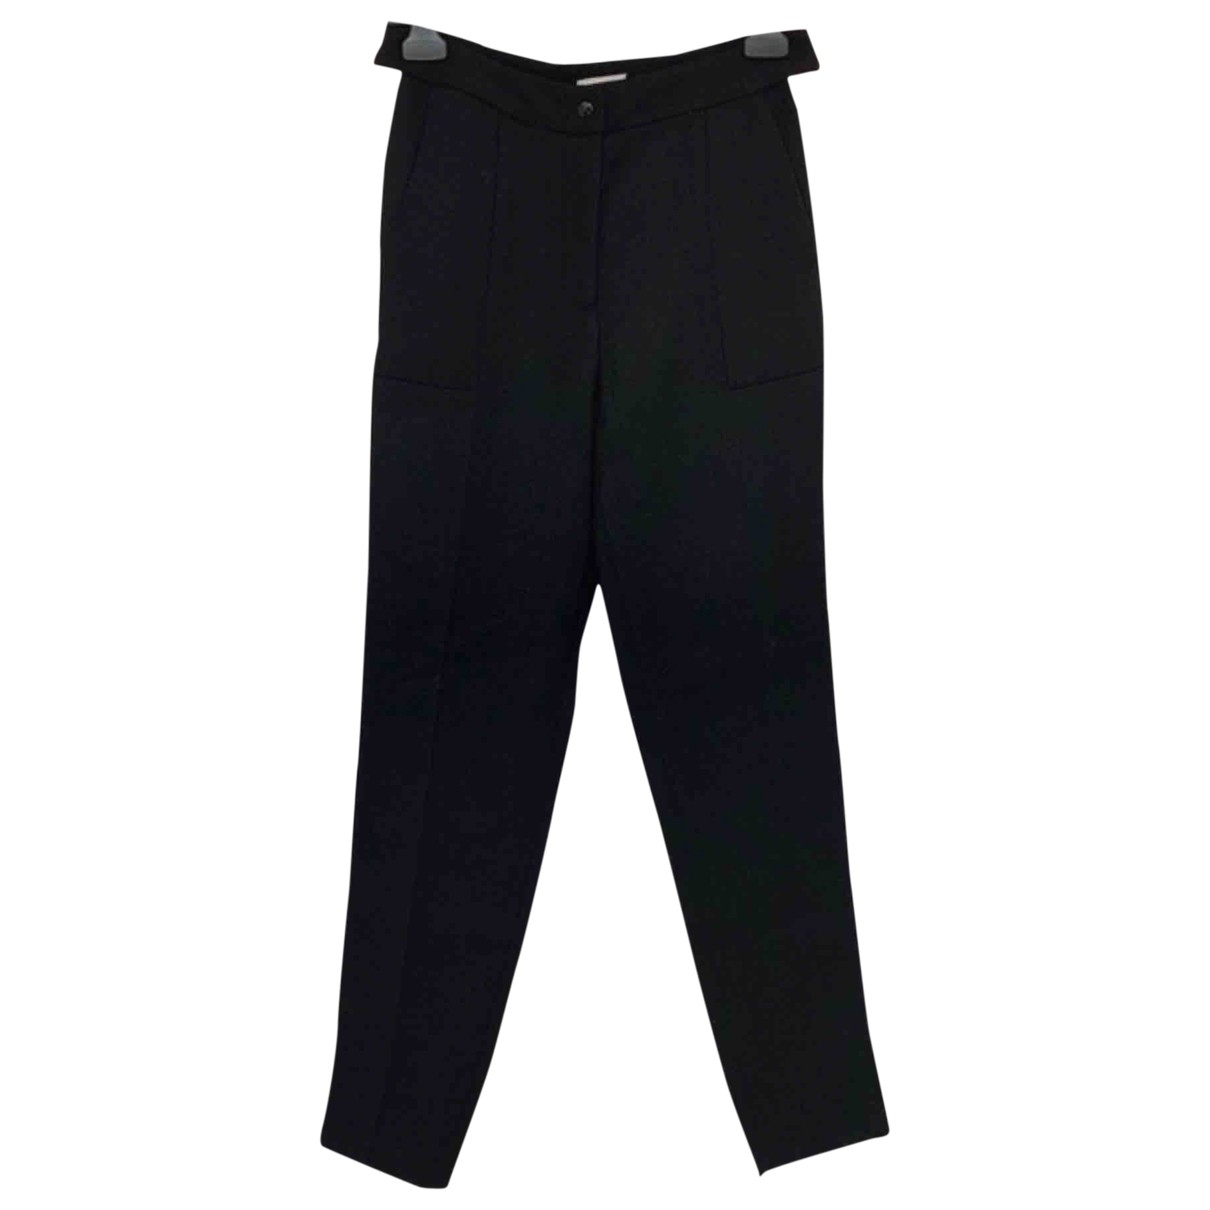 Claudie Pierlot \N Black Trousers for Women 34 FR